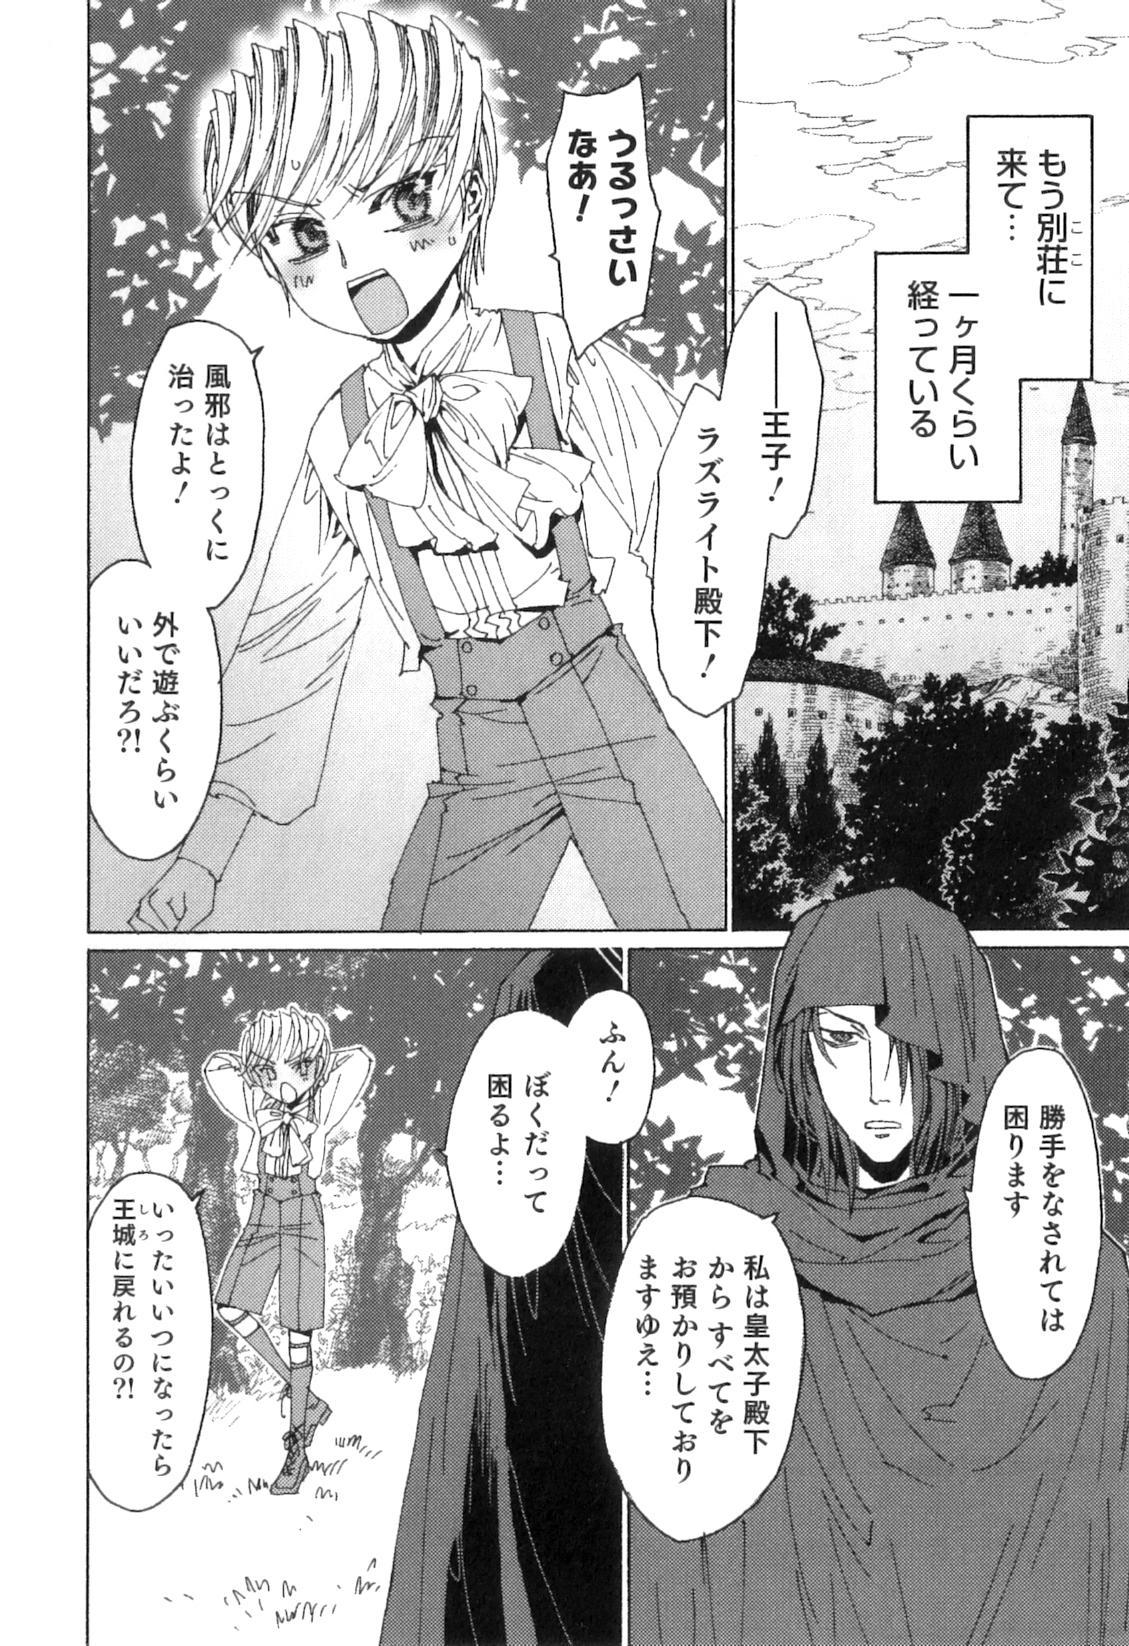 Yuni-Hapi 122